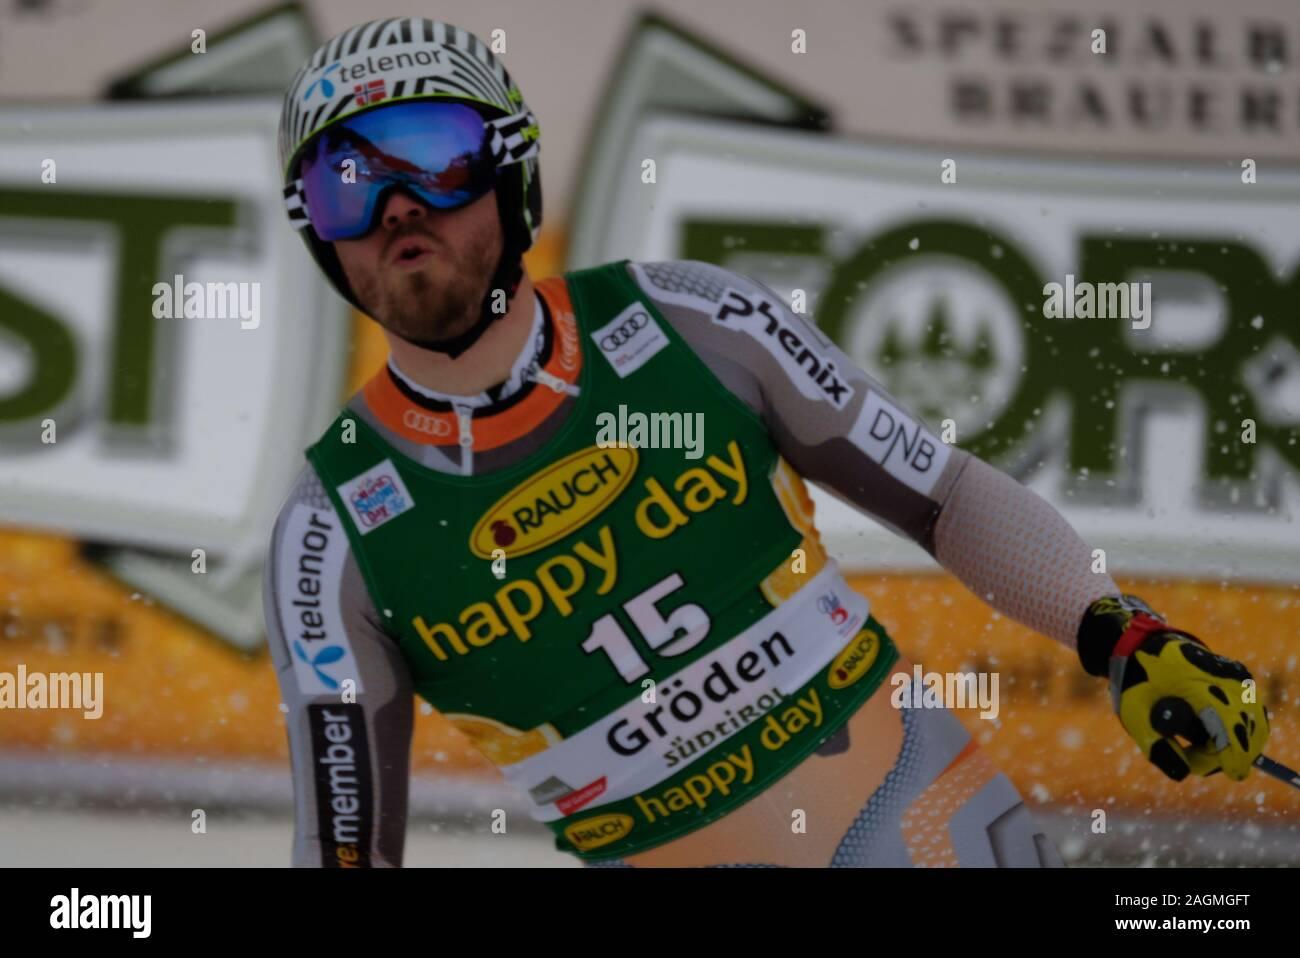 Val Gardena, Italy. 20th Dec, 2019. Super G Men, Ski in Val Gardena, Italy, December 20 2019 Credit: Independent Photo Agency/Alamy Live News Stock Photo